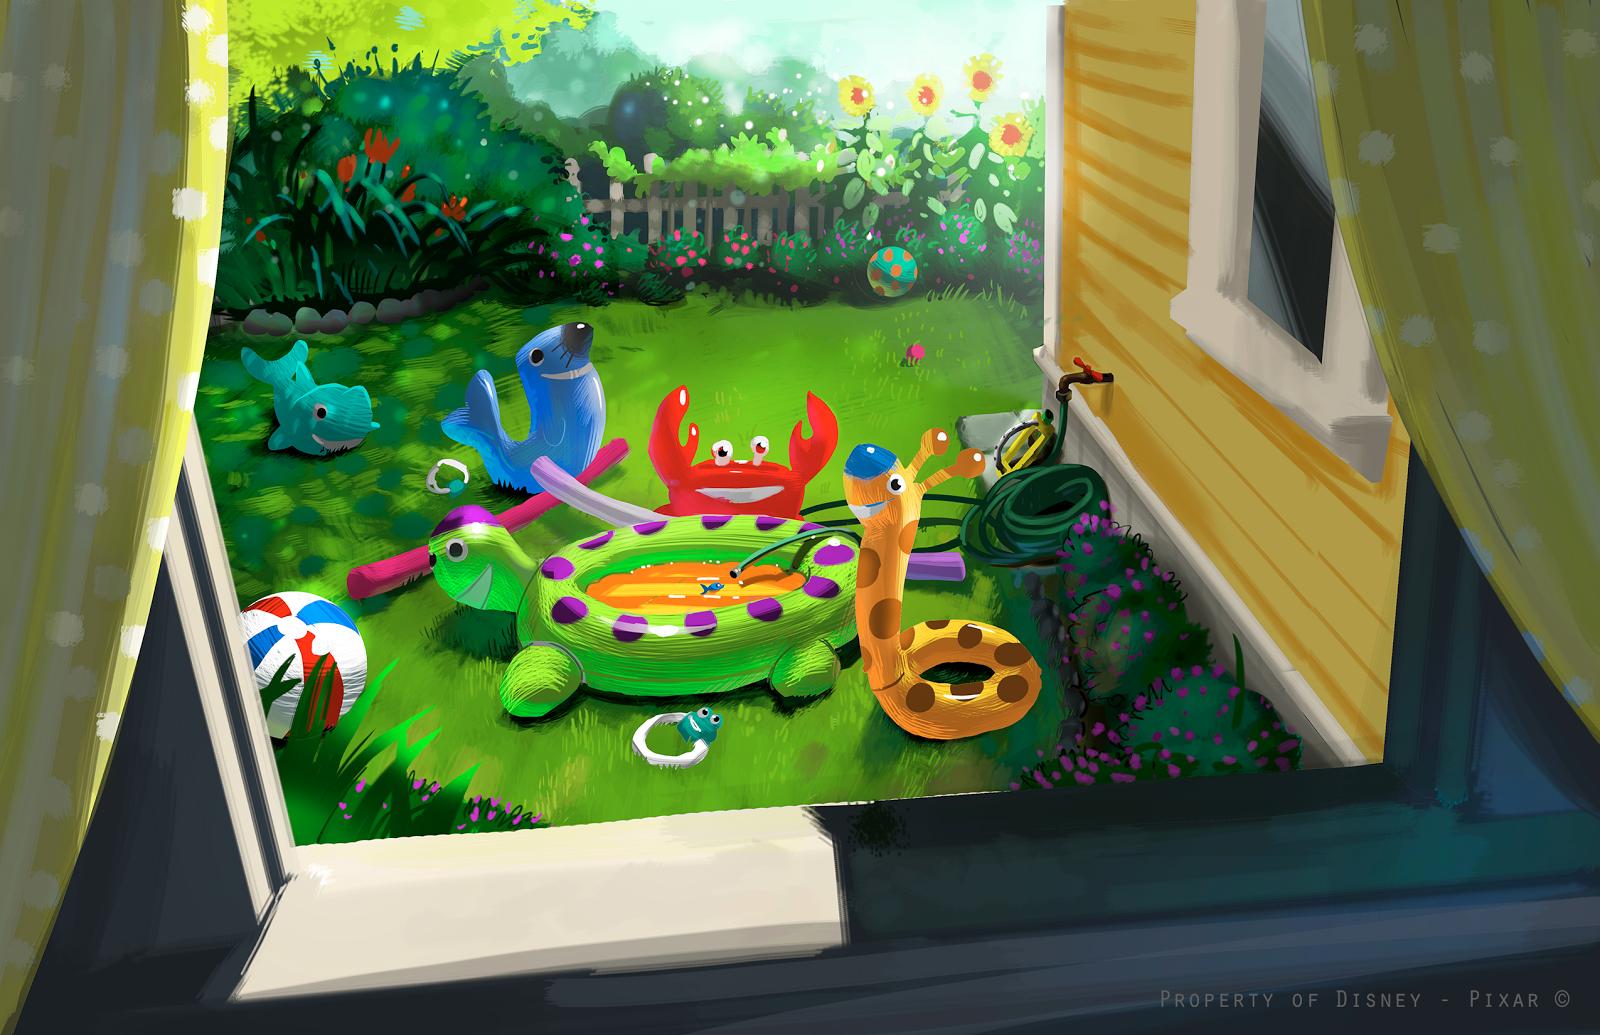 Toy Story Partysaurus Rex Concept Art